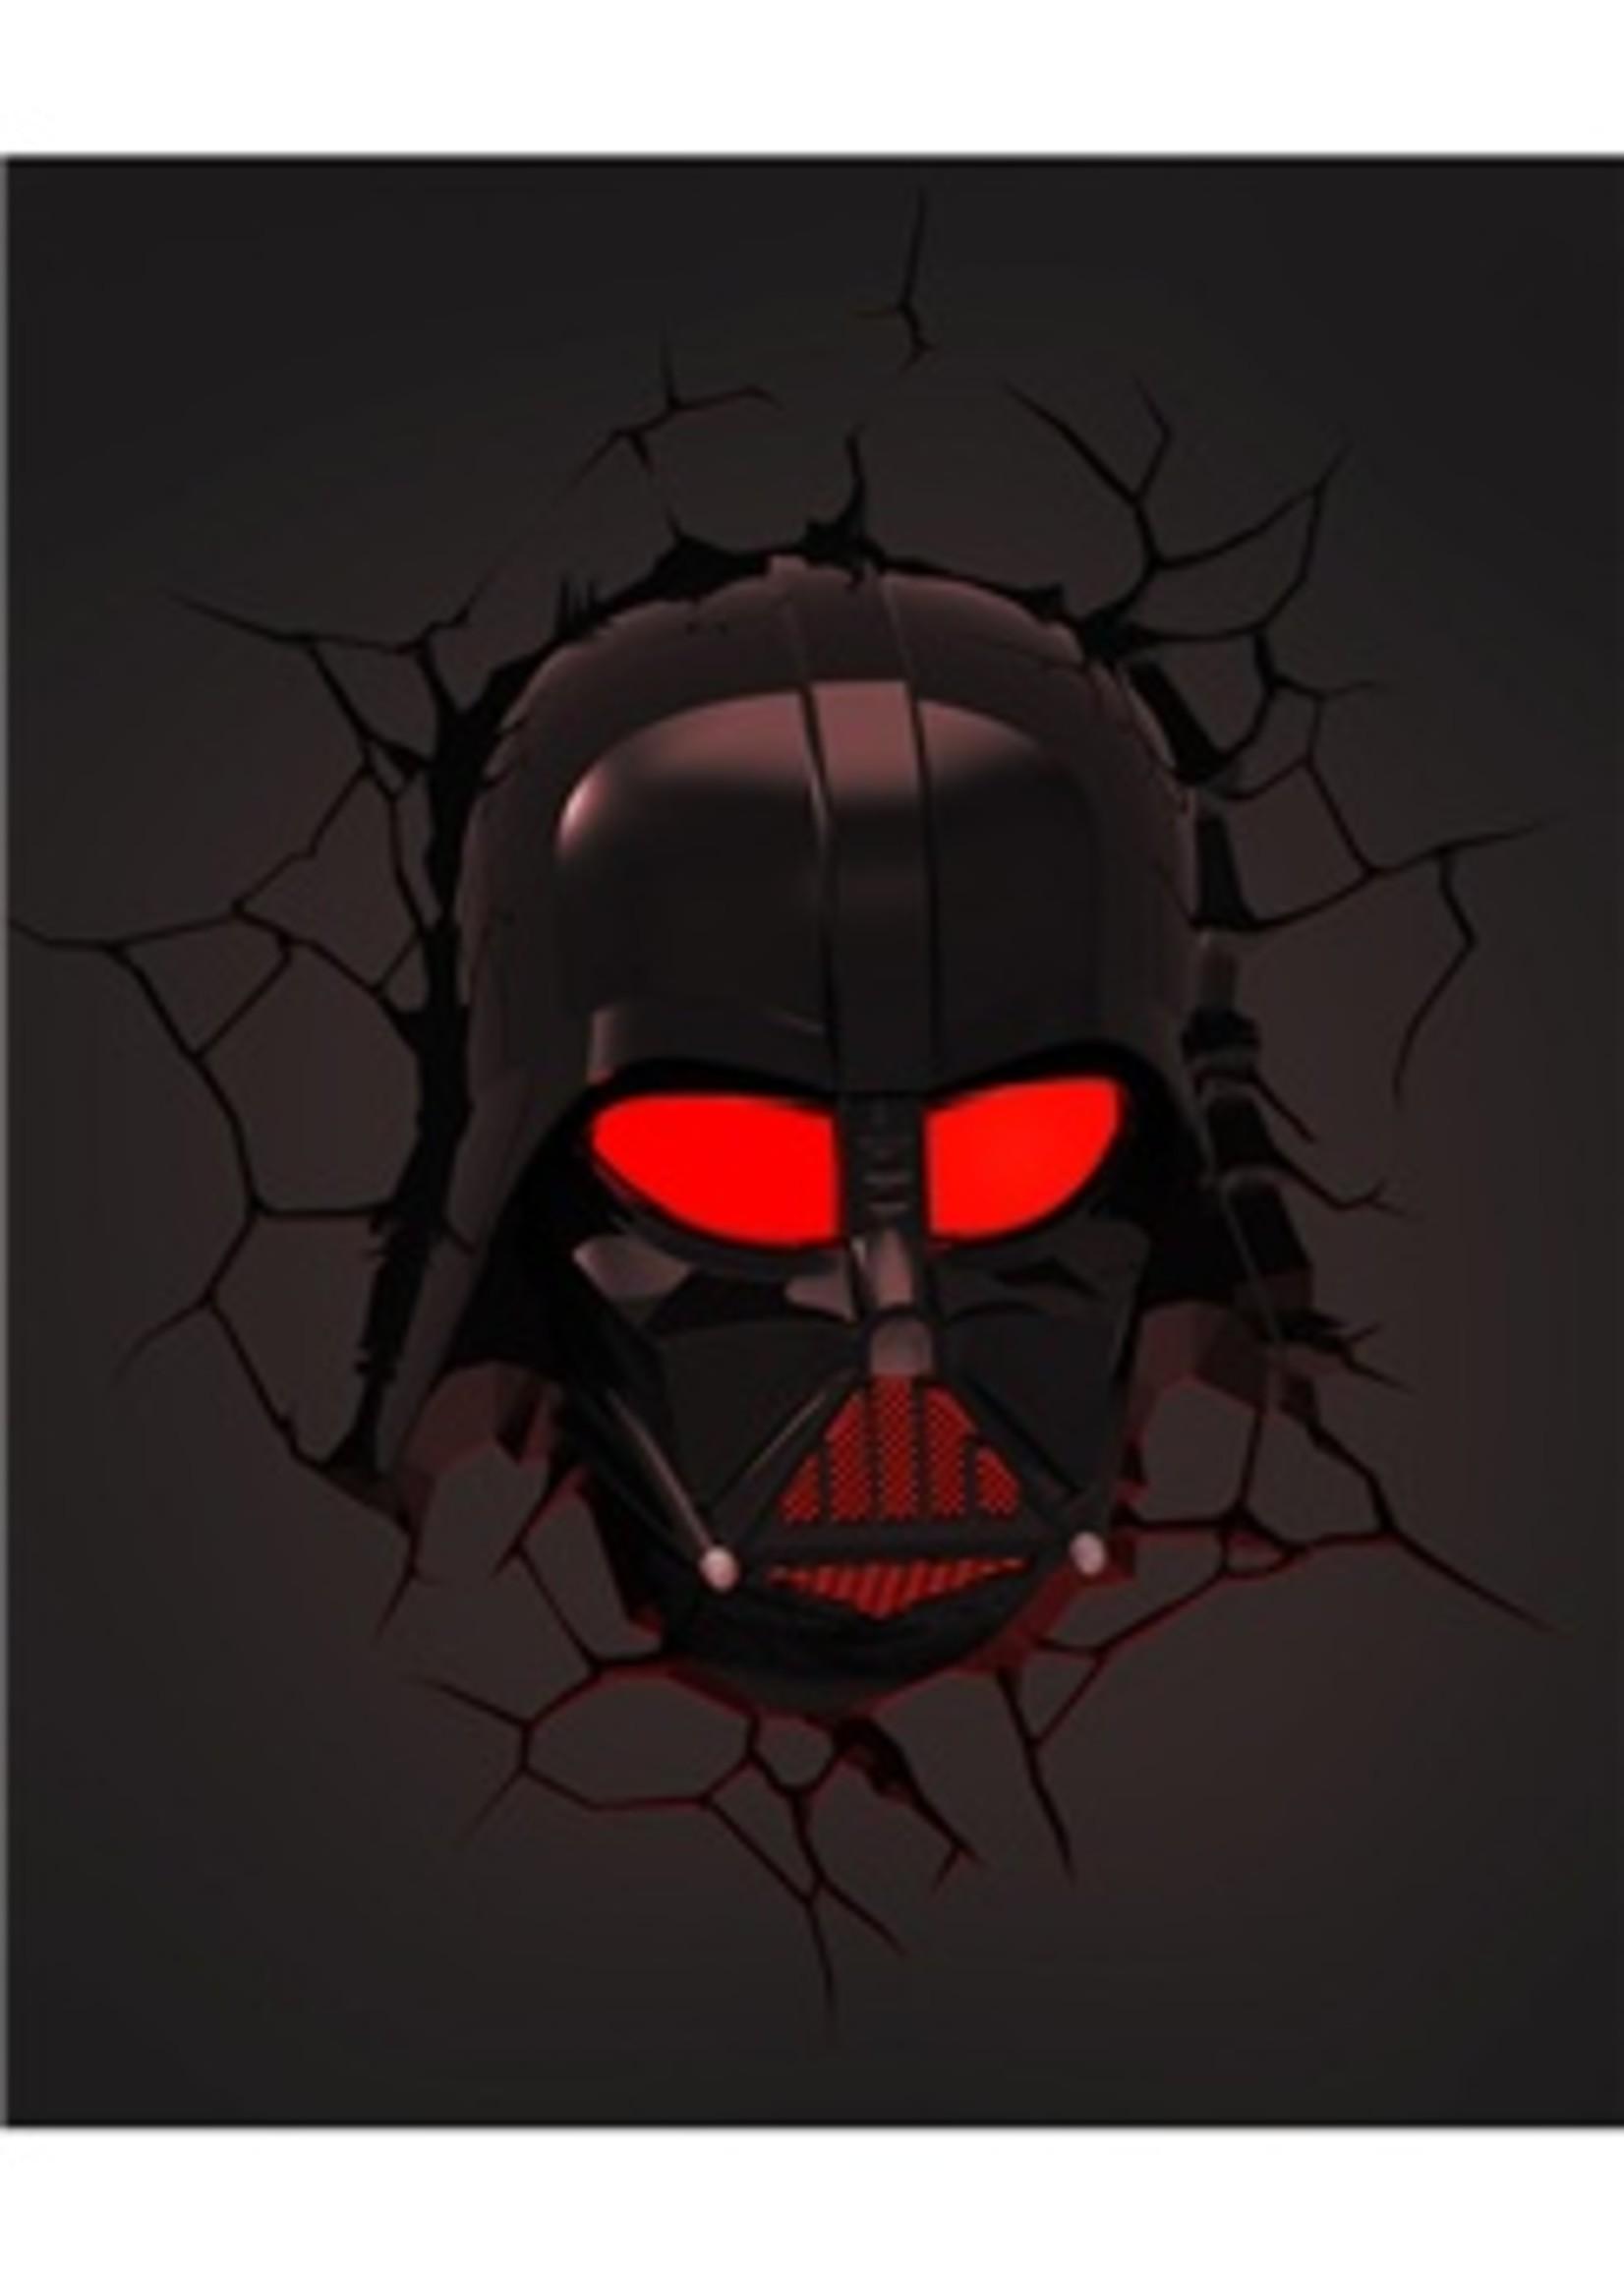 Star Wars Lamp Darth Vader